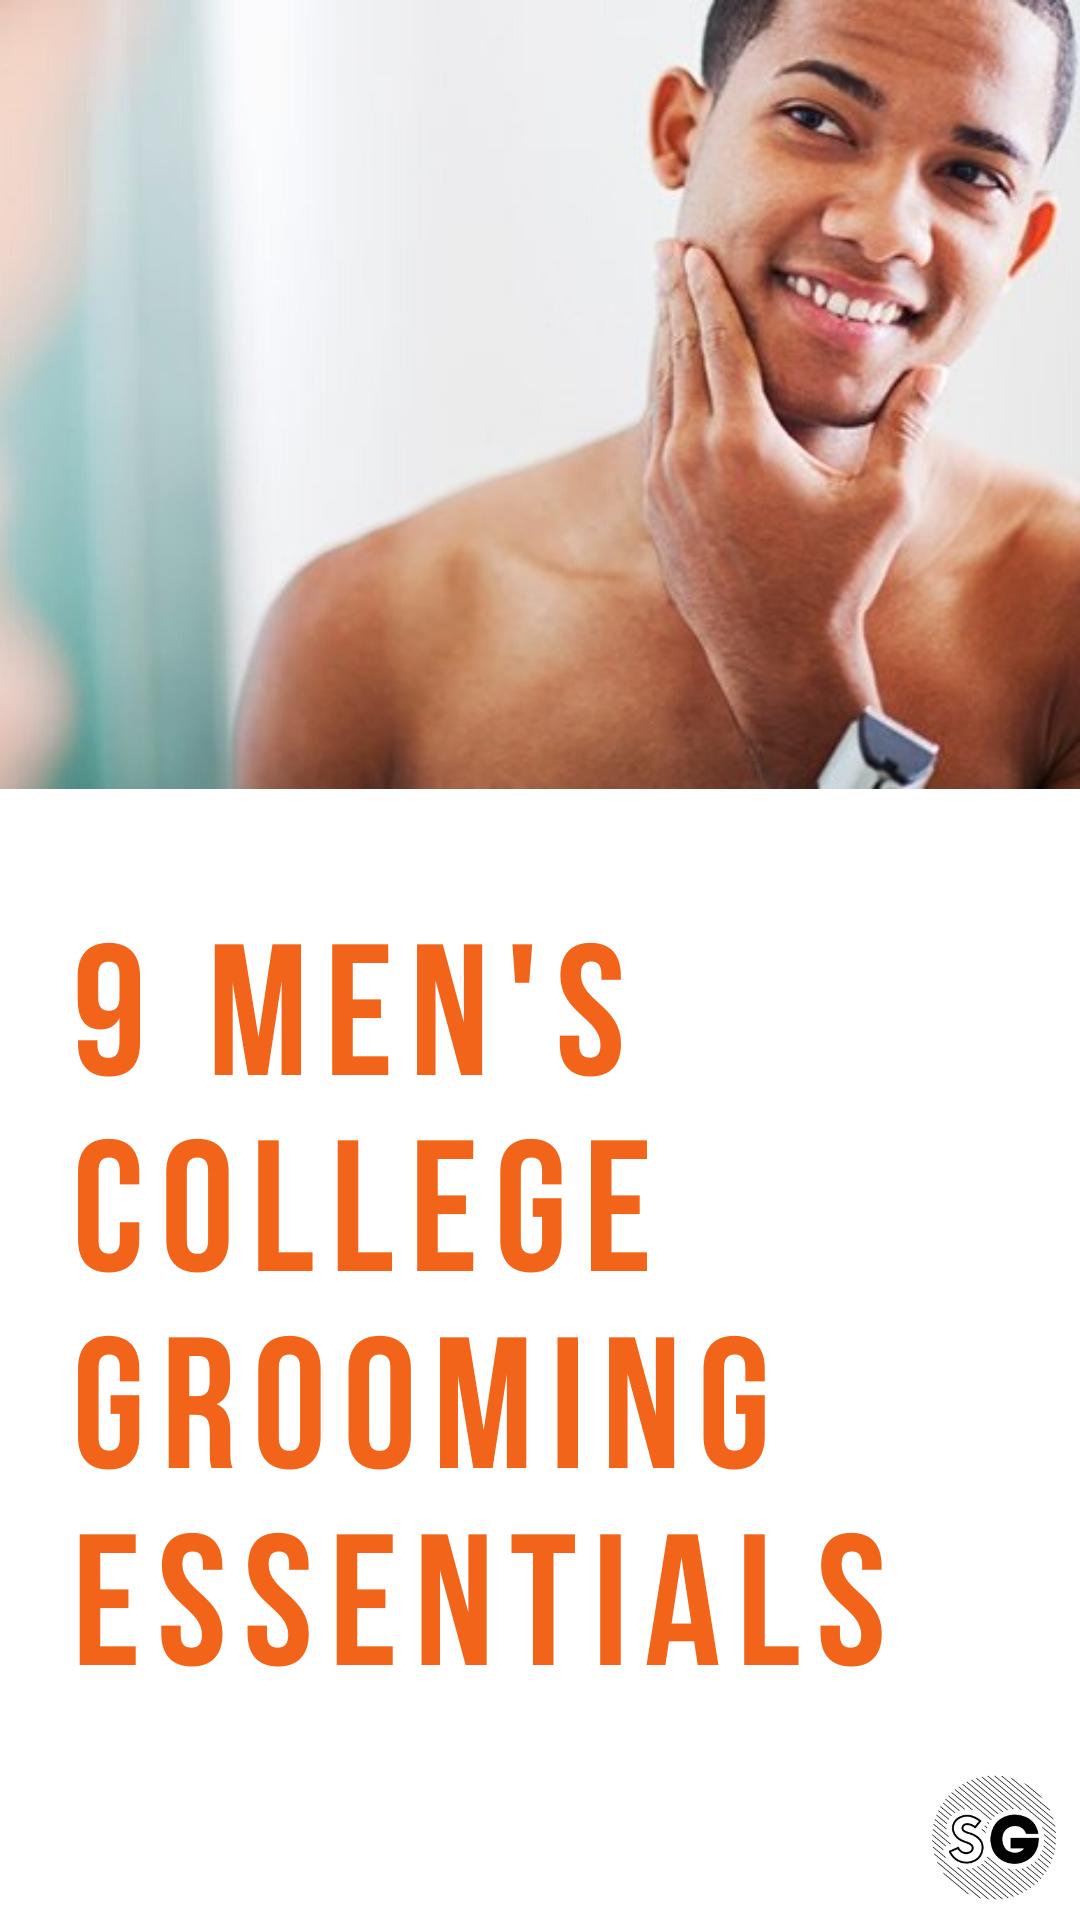 9 Men's Grooming Essentials for College Guys Guys